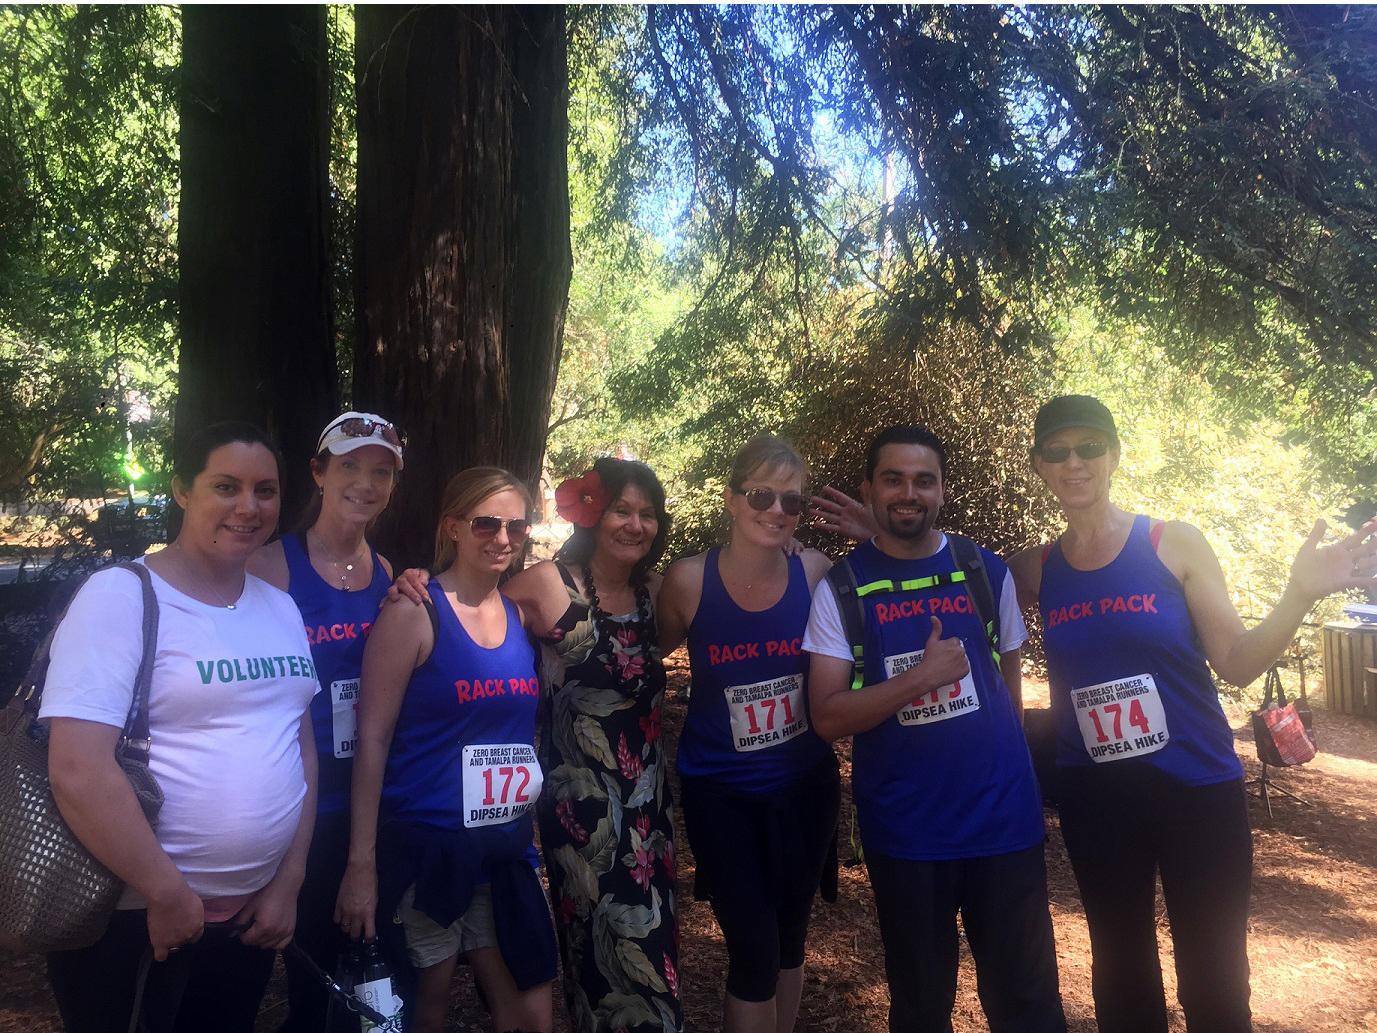 3rd Quarter 2015 Zero-Breast-Cancer-Dipsea-Hike-Team-Photo-2015